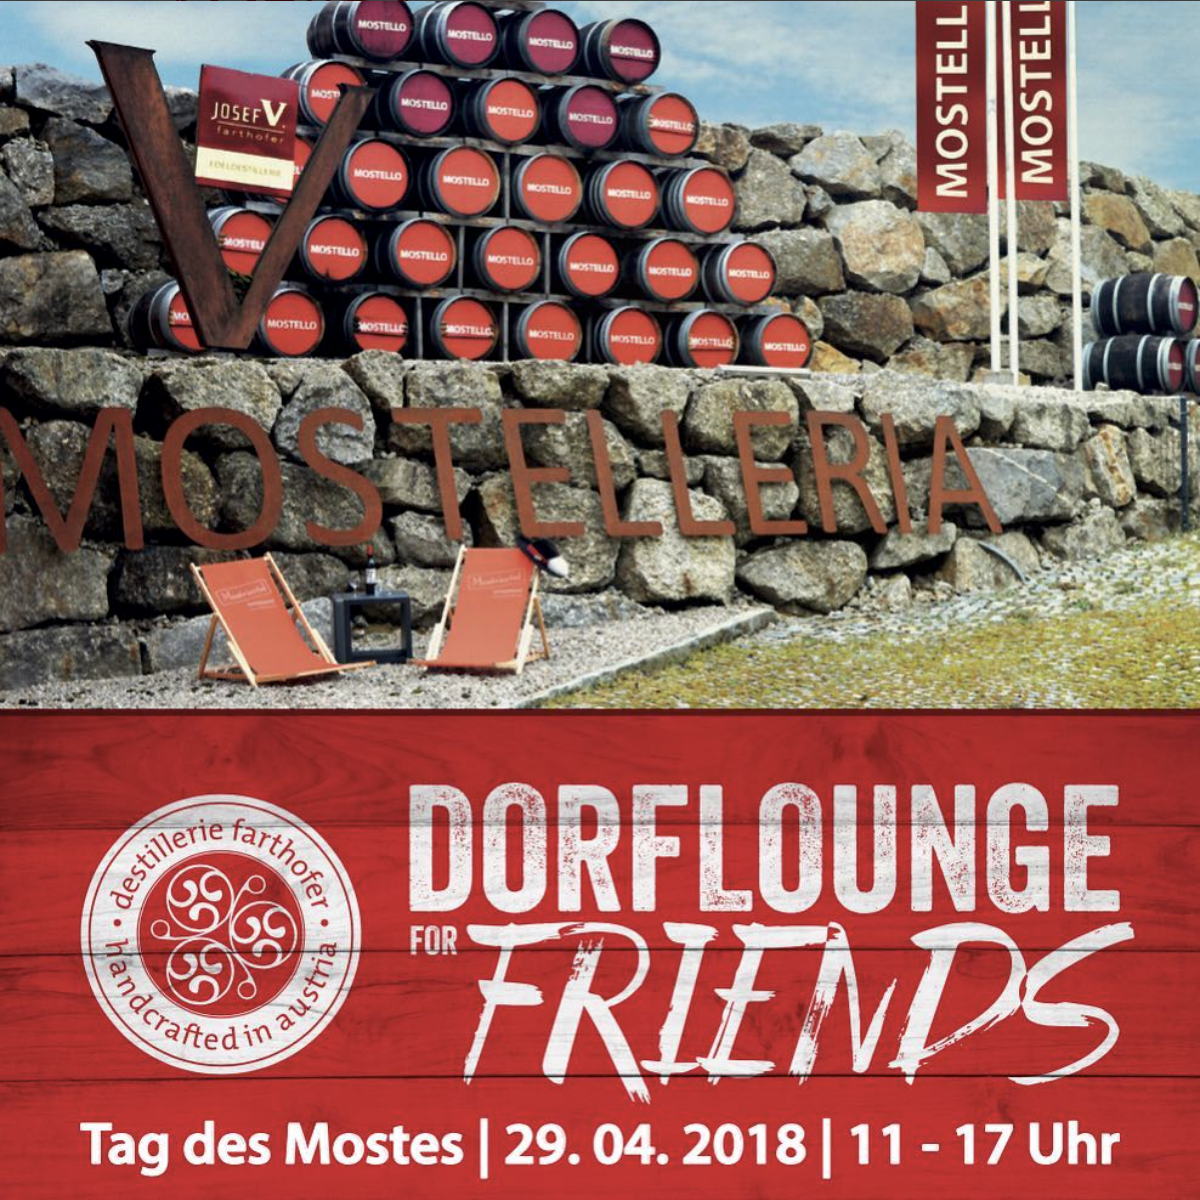 Dorflounge for Friends